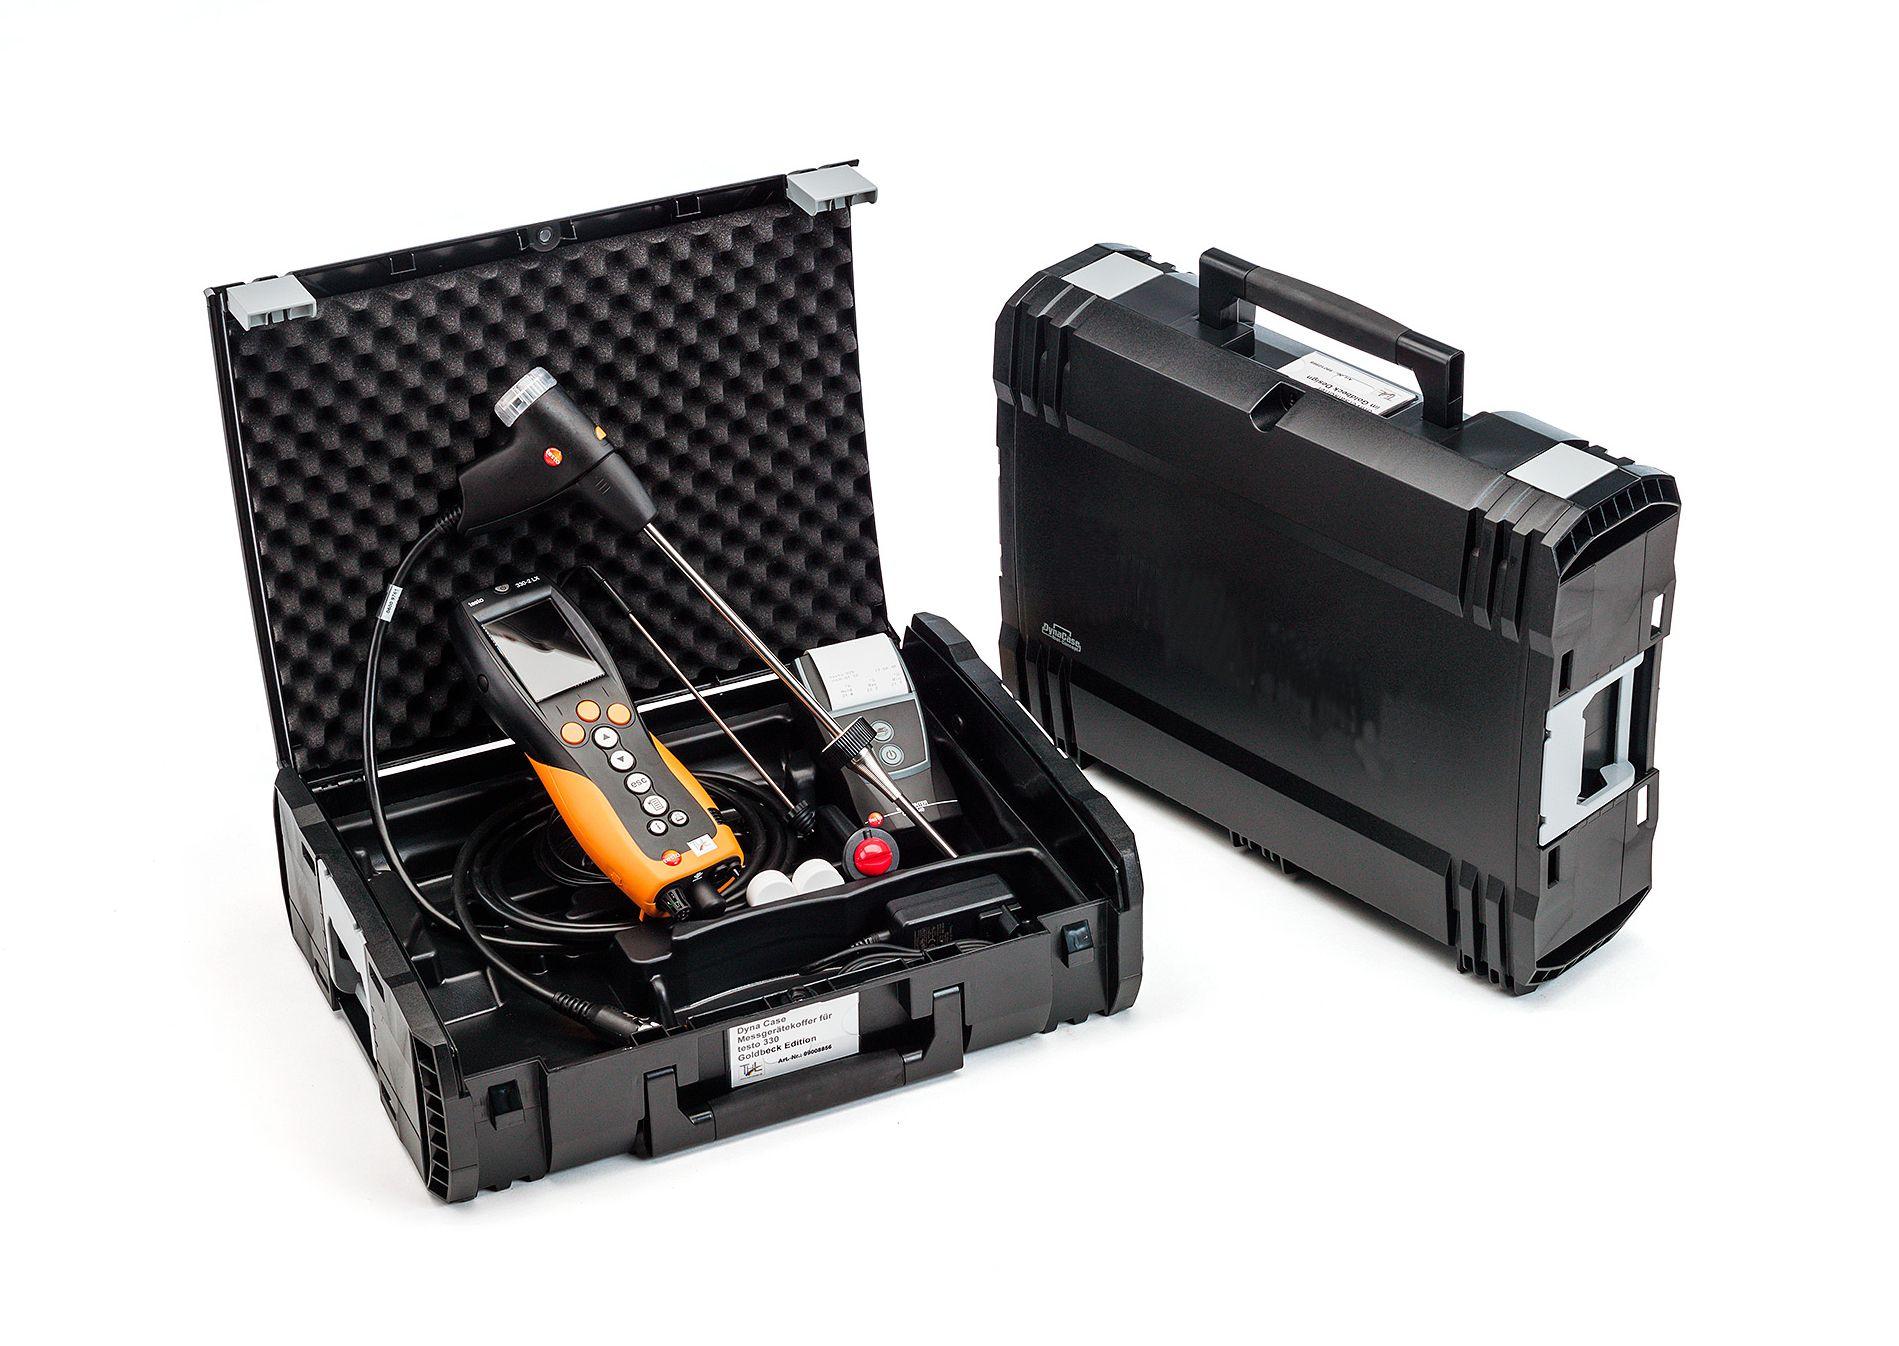 Abgasmessgeräte Set testo 330-2 LX im DynaCase inkl. Drucker